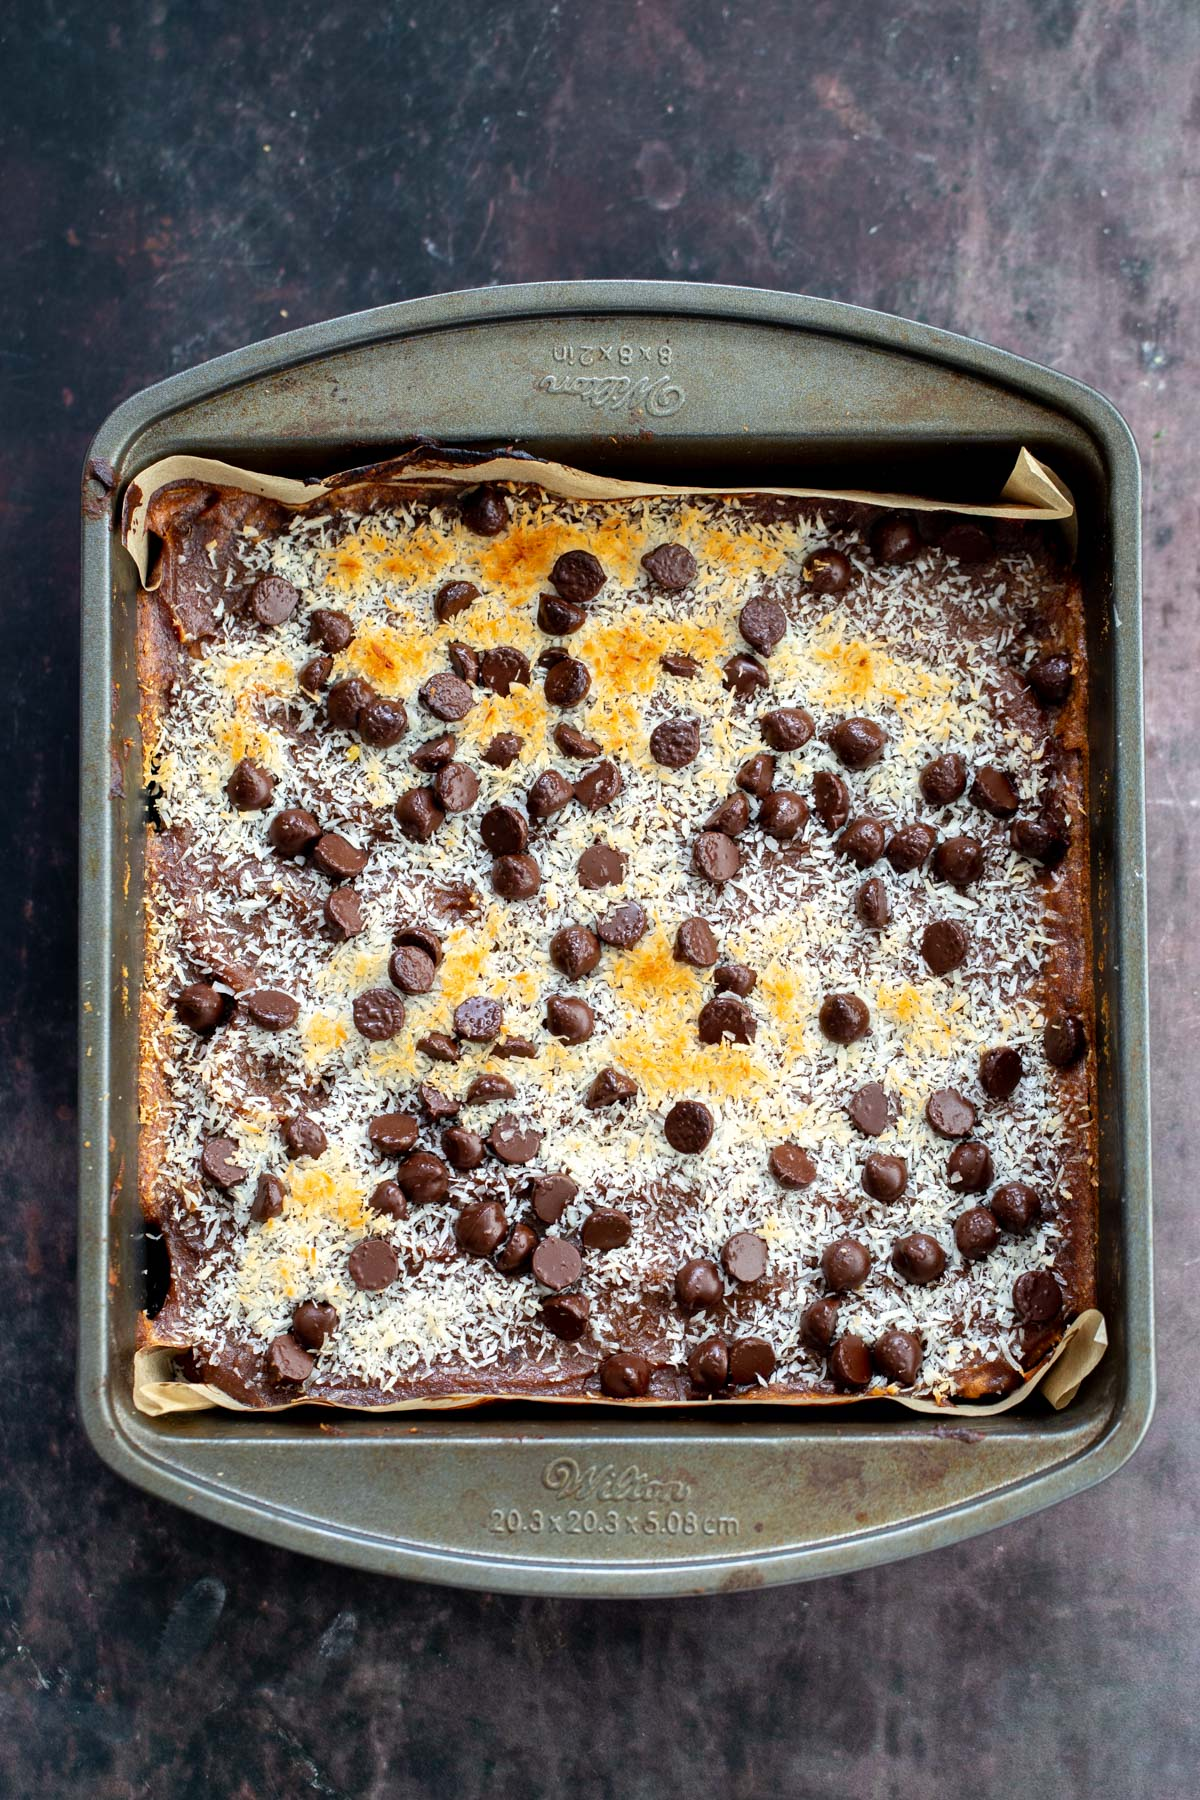 freshly baked vegan carmelita oatmeal caramel bars in a baking pan